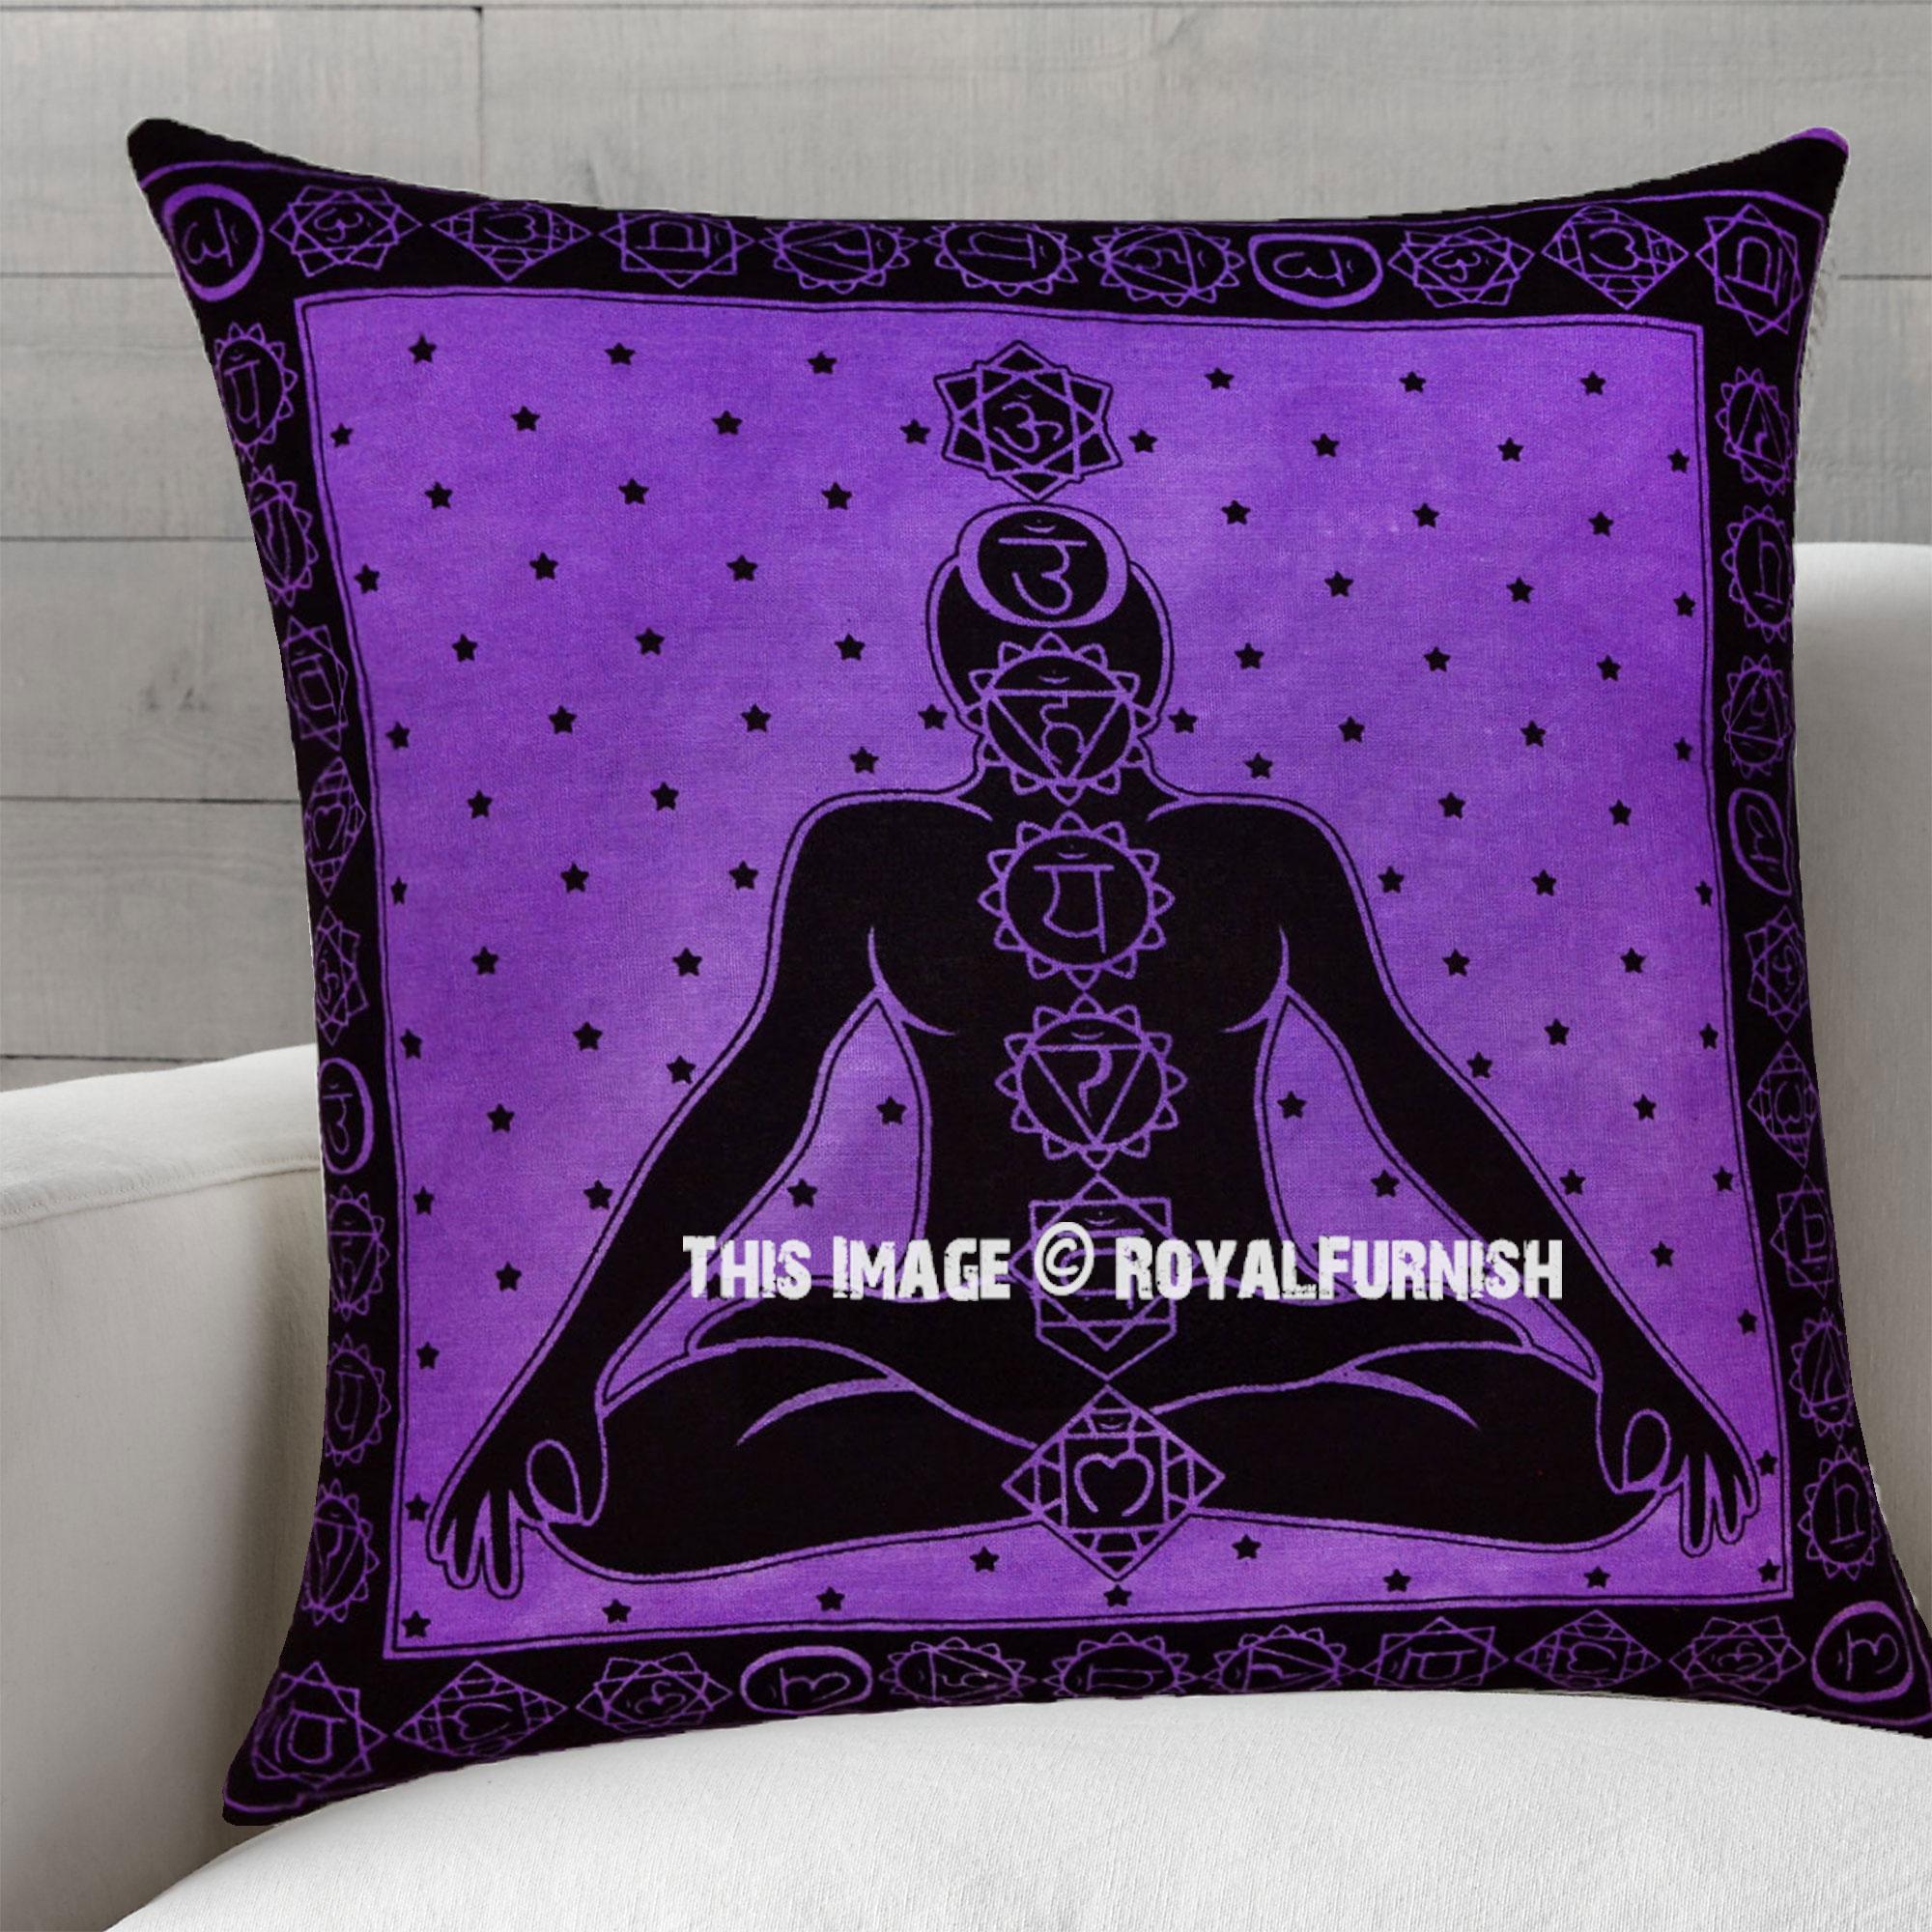 Purple Decorative And Boho Accent Yoga Meditation Chakras Tie Dye Pillow Cover